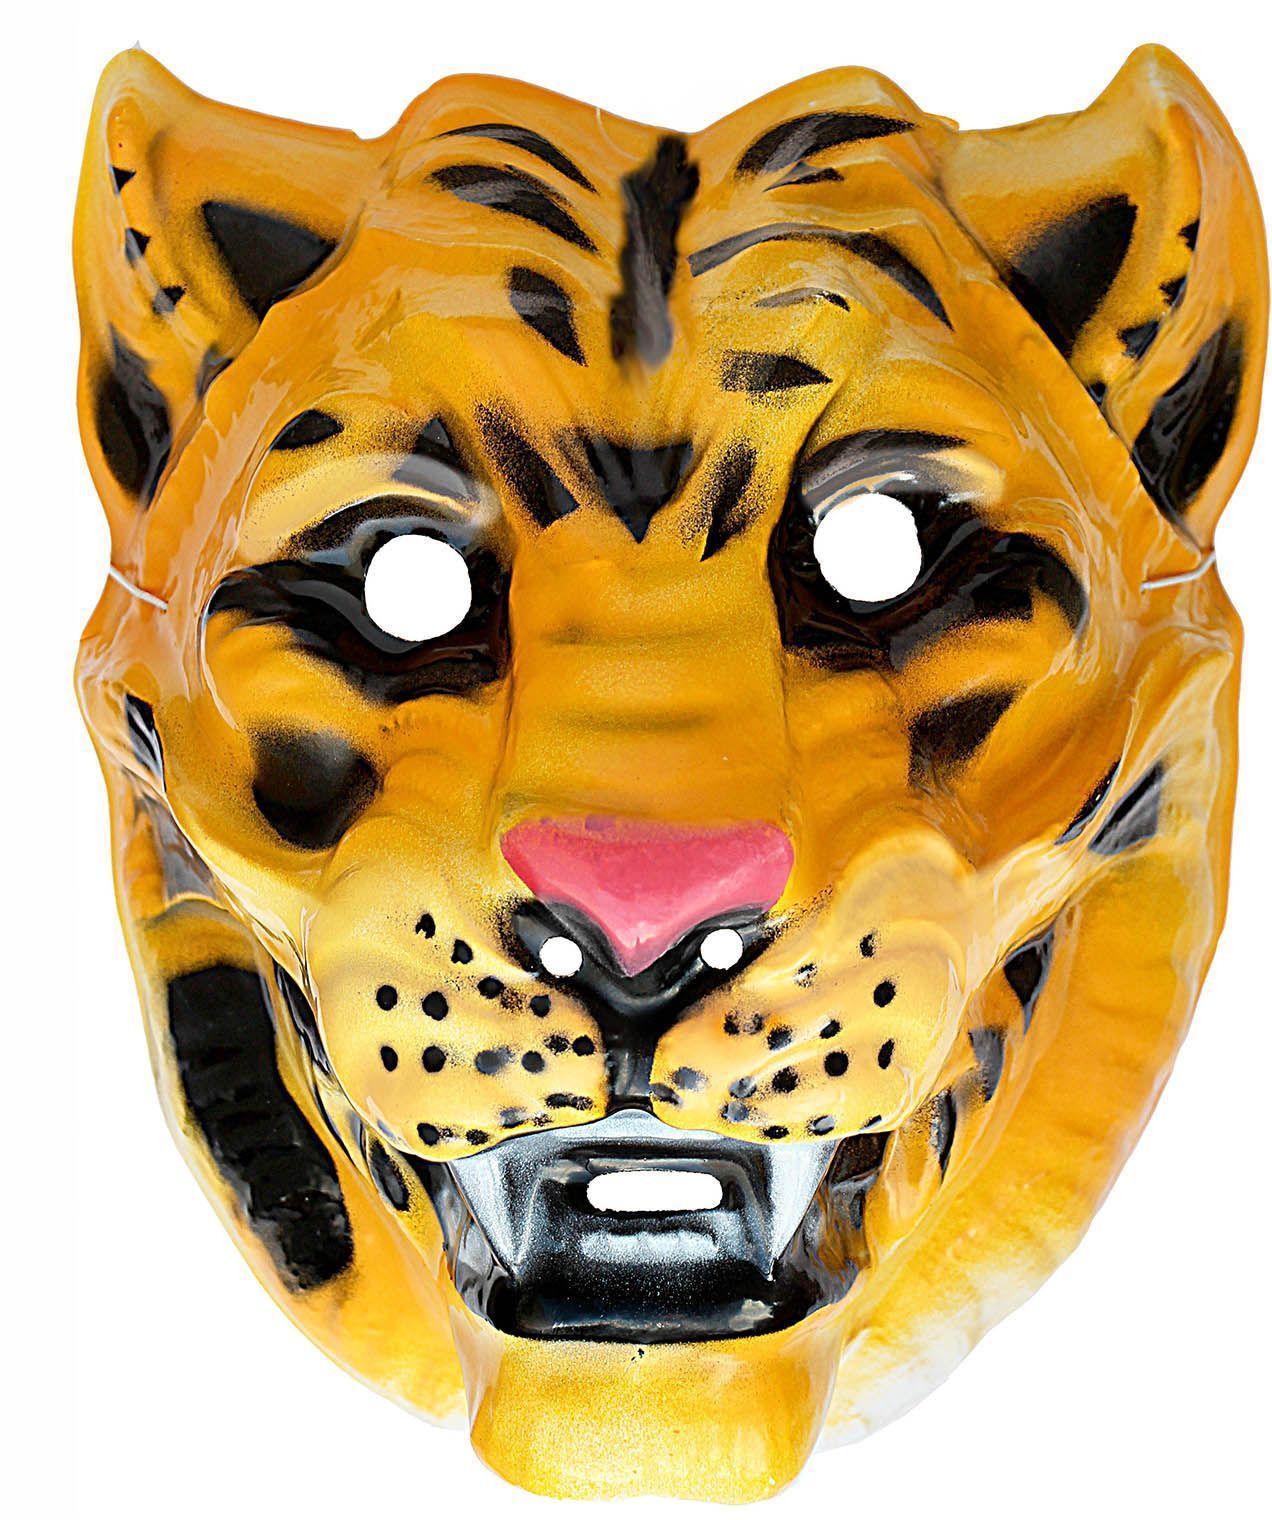 Tijger masker plastic